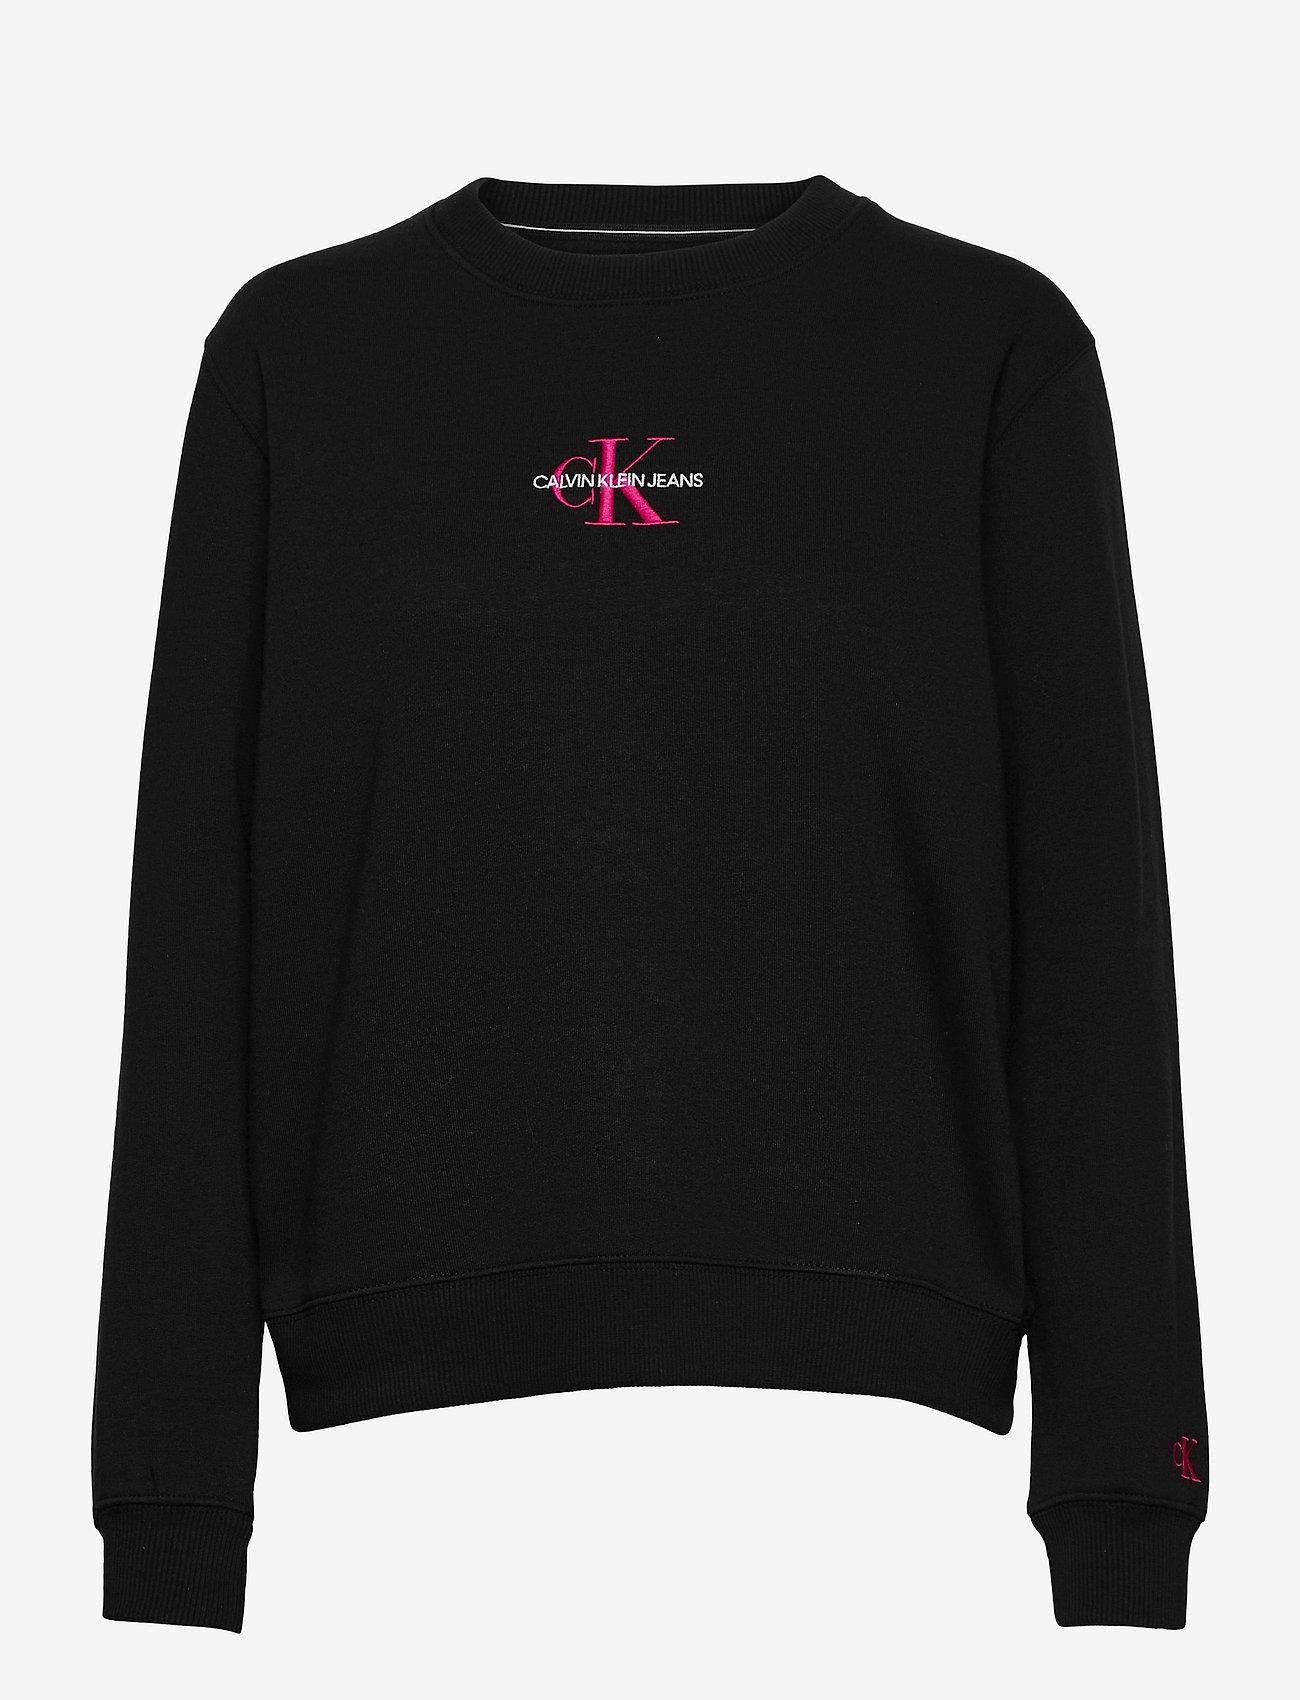 Calvin Klein Jeans - MONOGRAM LOGO CREW NECK - sweatshirts - ck black/party pink - 0